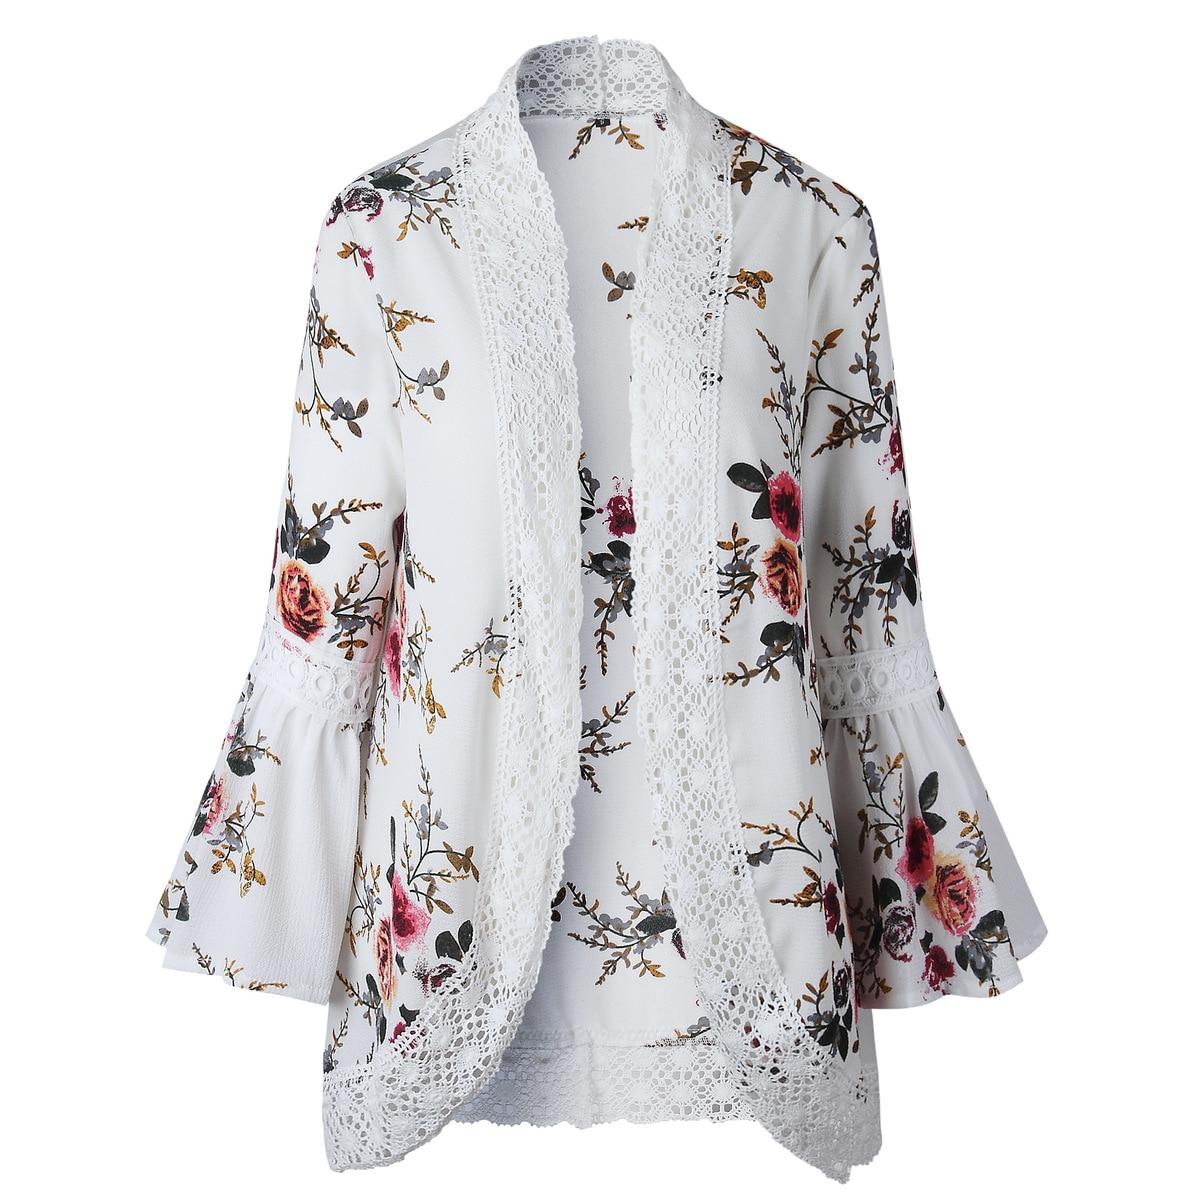 HTB1ANyPEf5TBuNjSspcq6znGFXaR Women Plus Size Loose Casual Basic Jackets Female 2018 Autumn Long Flare Sleeve Floral Print Outwear Coat Open Stitch Clothing